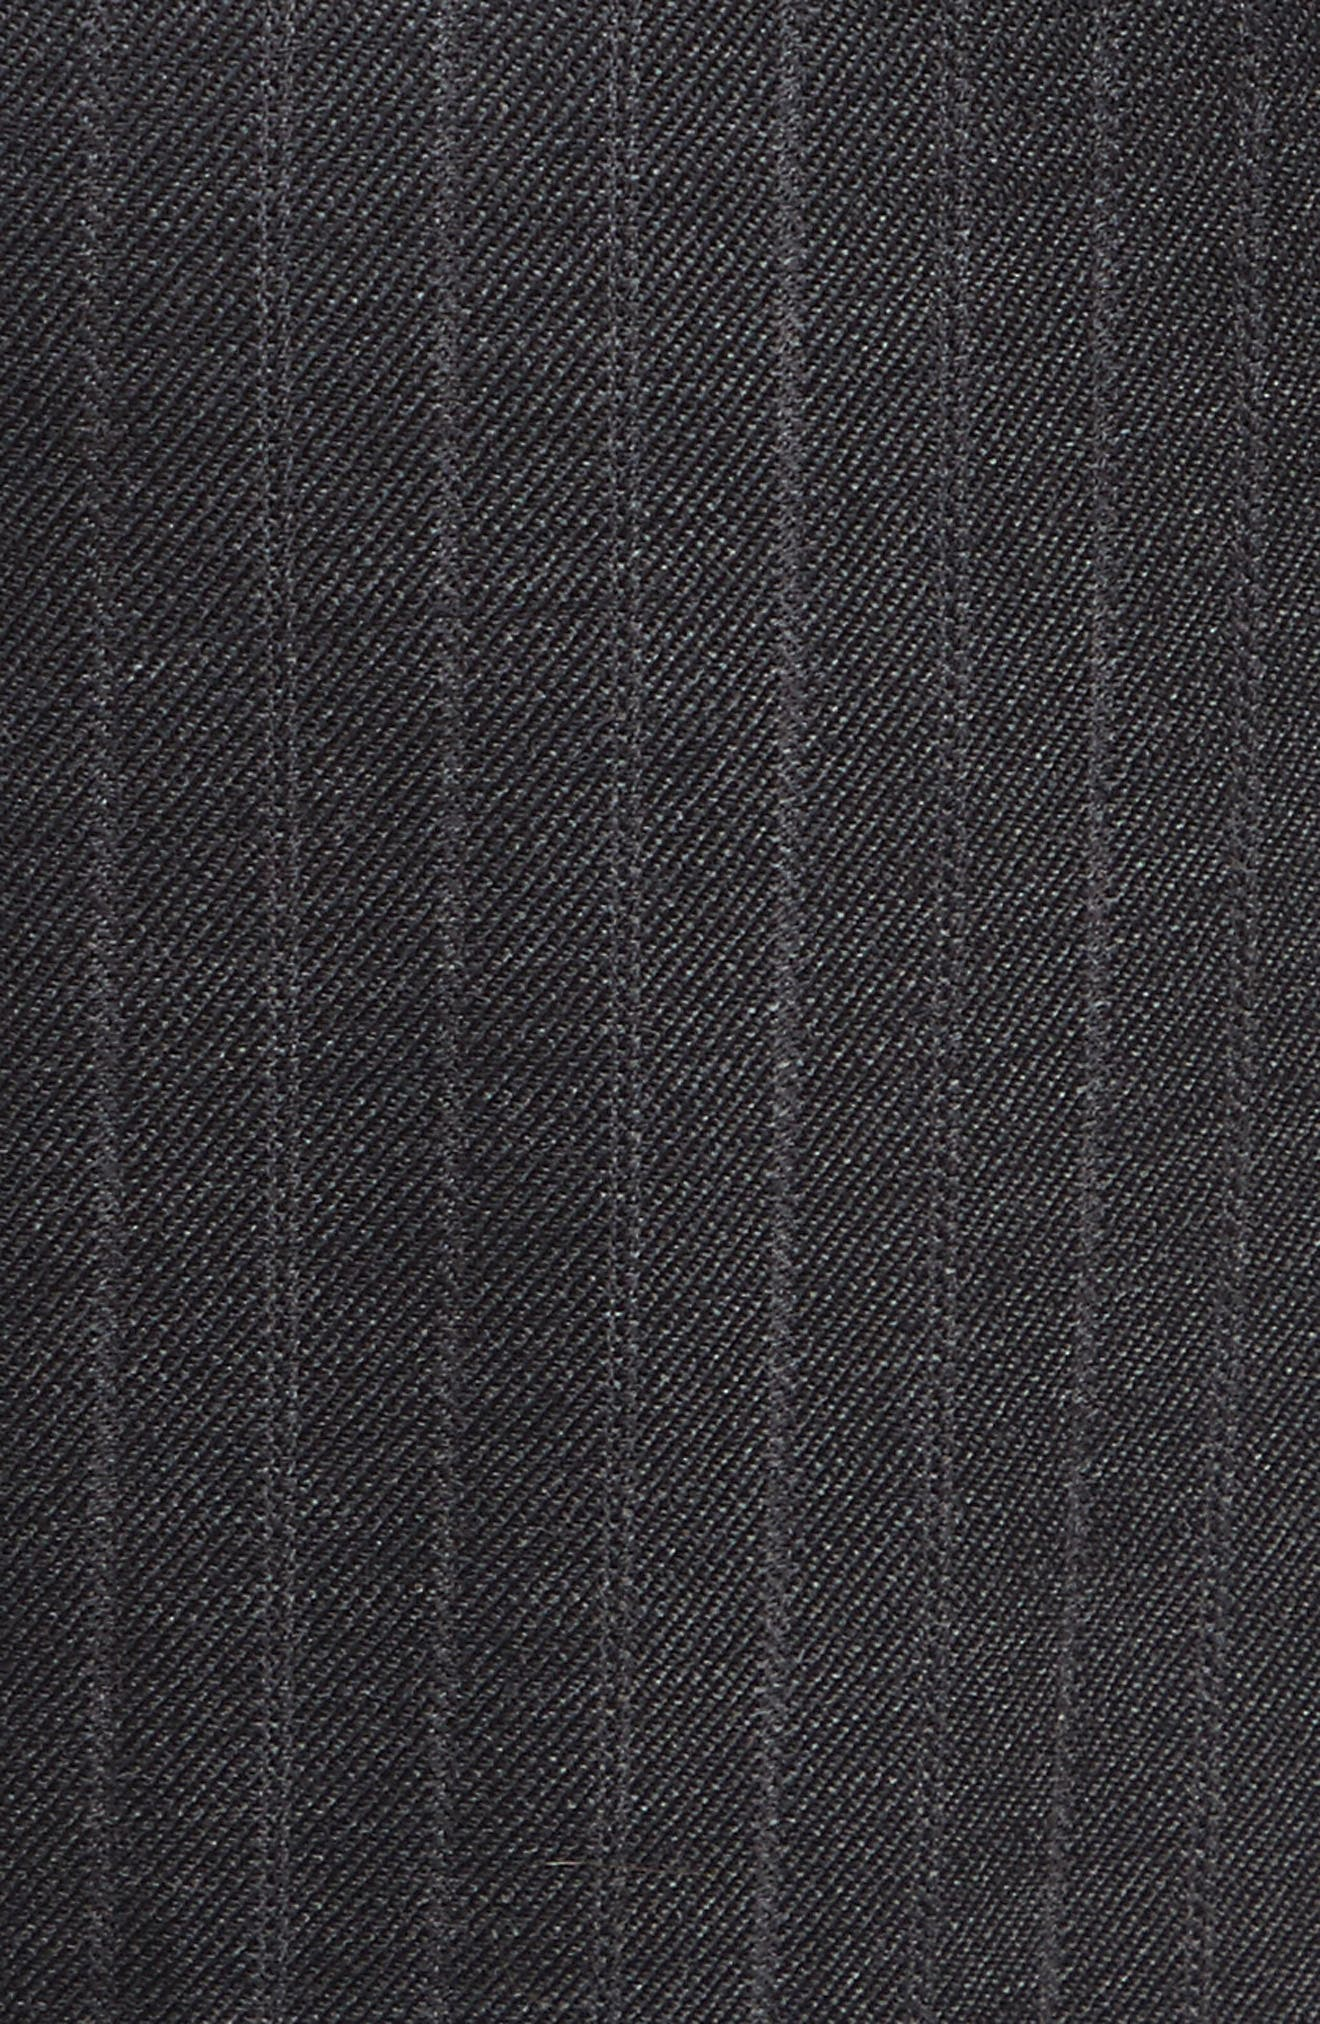 Sia Pinstripe Italian Stretch Wool Trousers,                             Alternate thumbnail 6, color,                             Grey Stripe